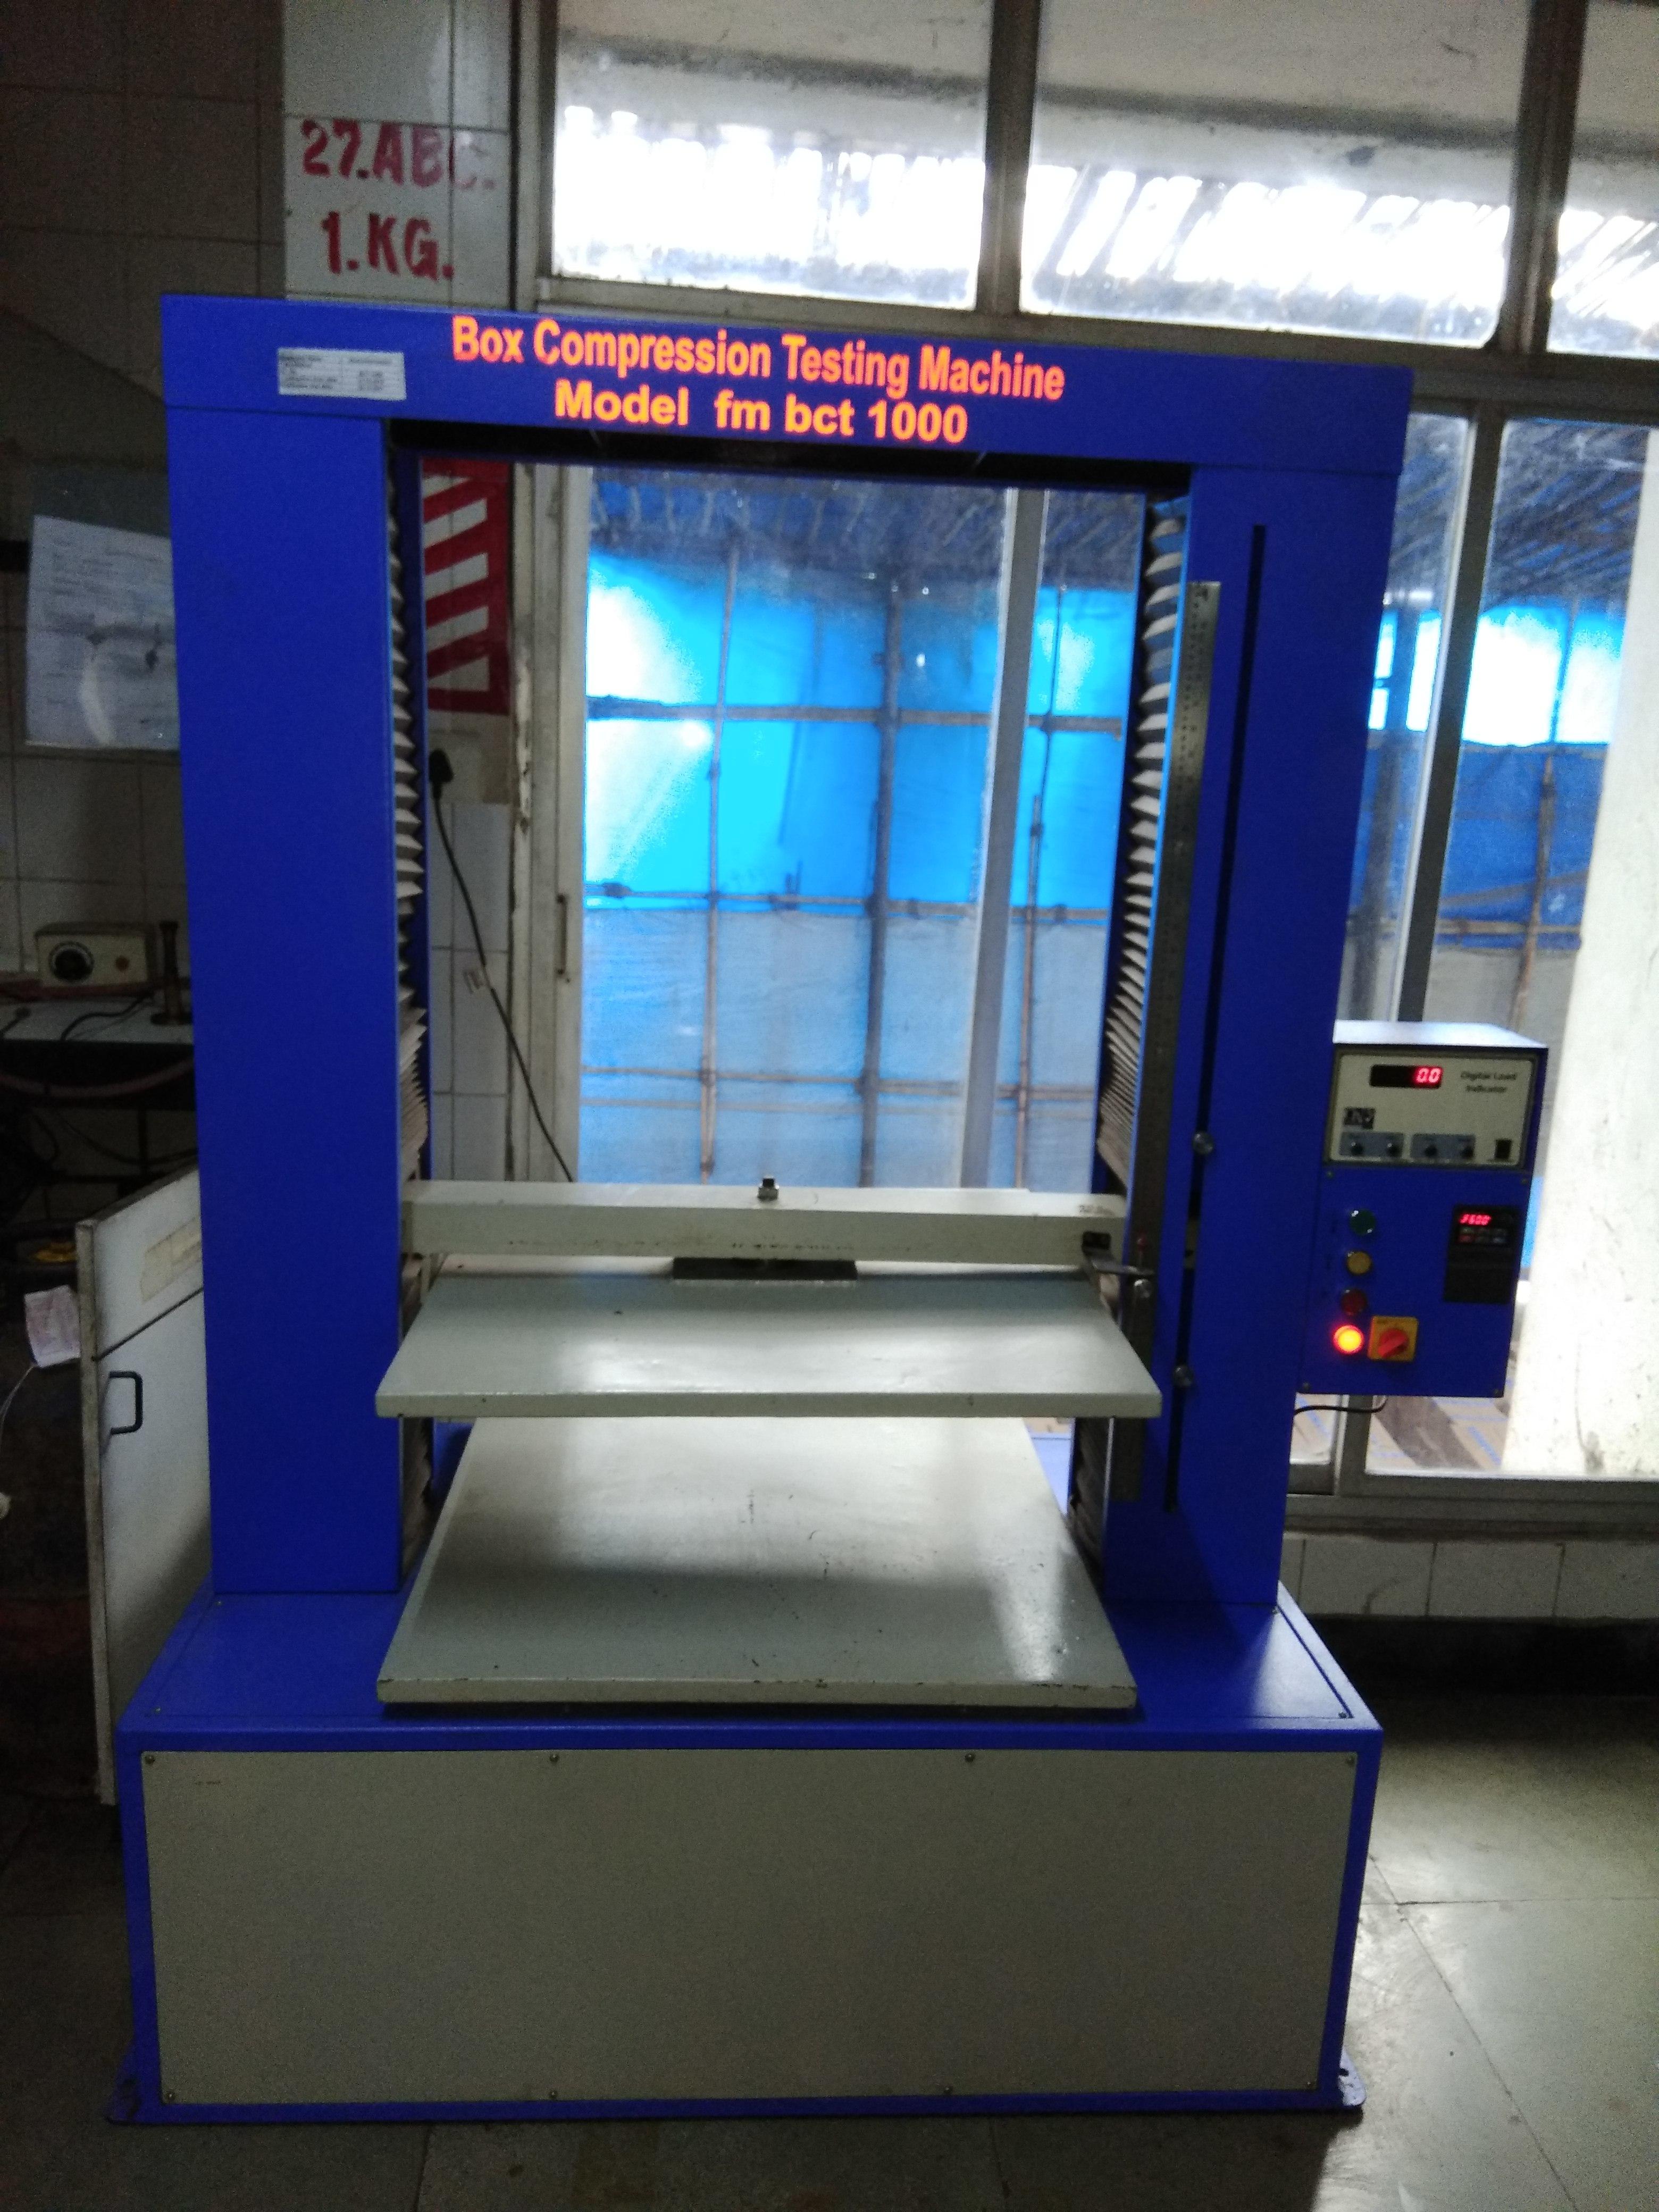 Box Compression Testing Machine